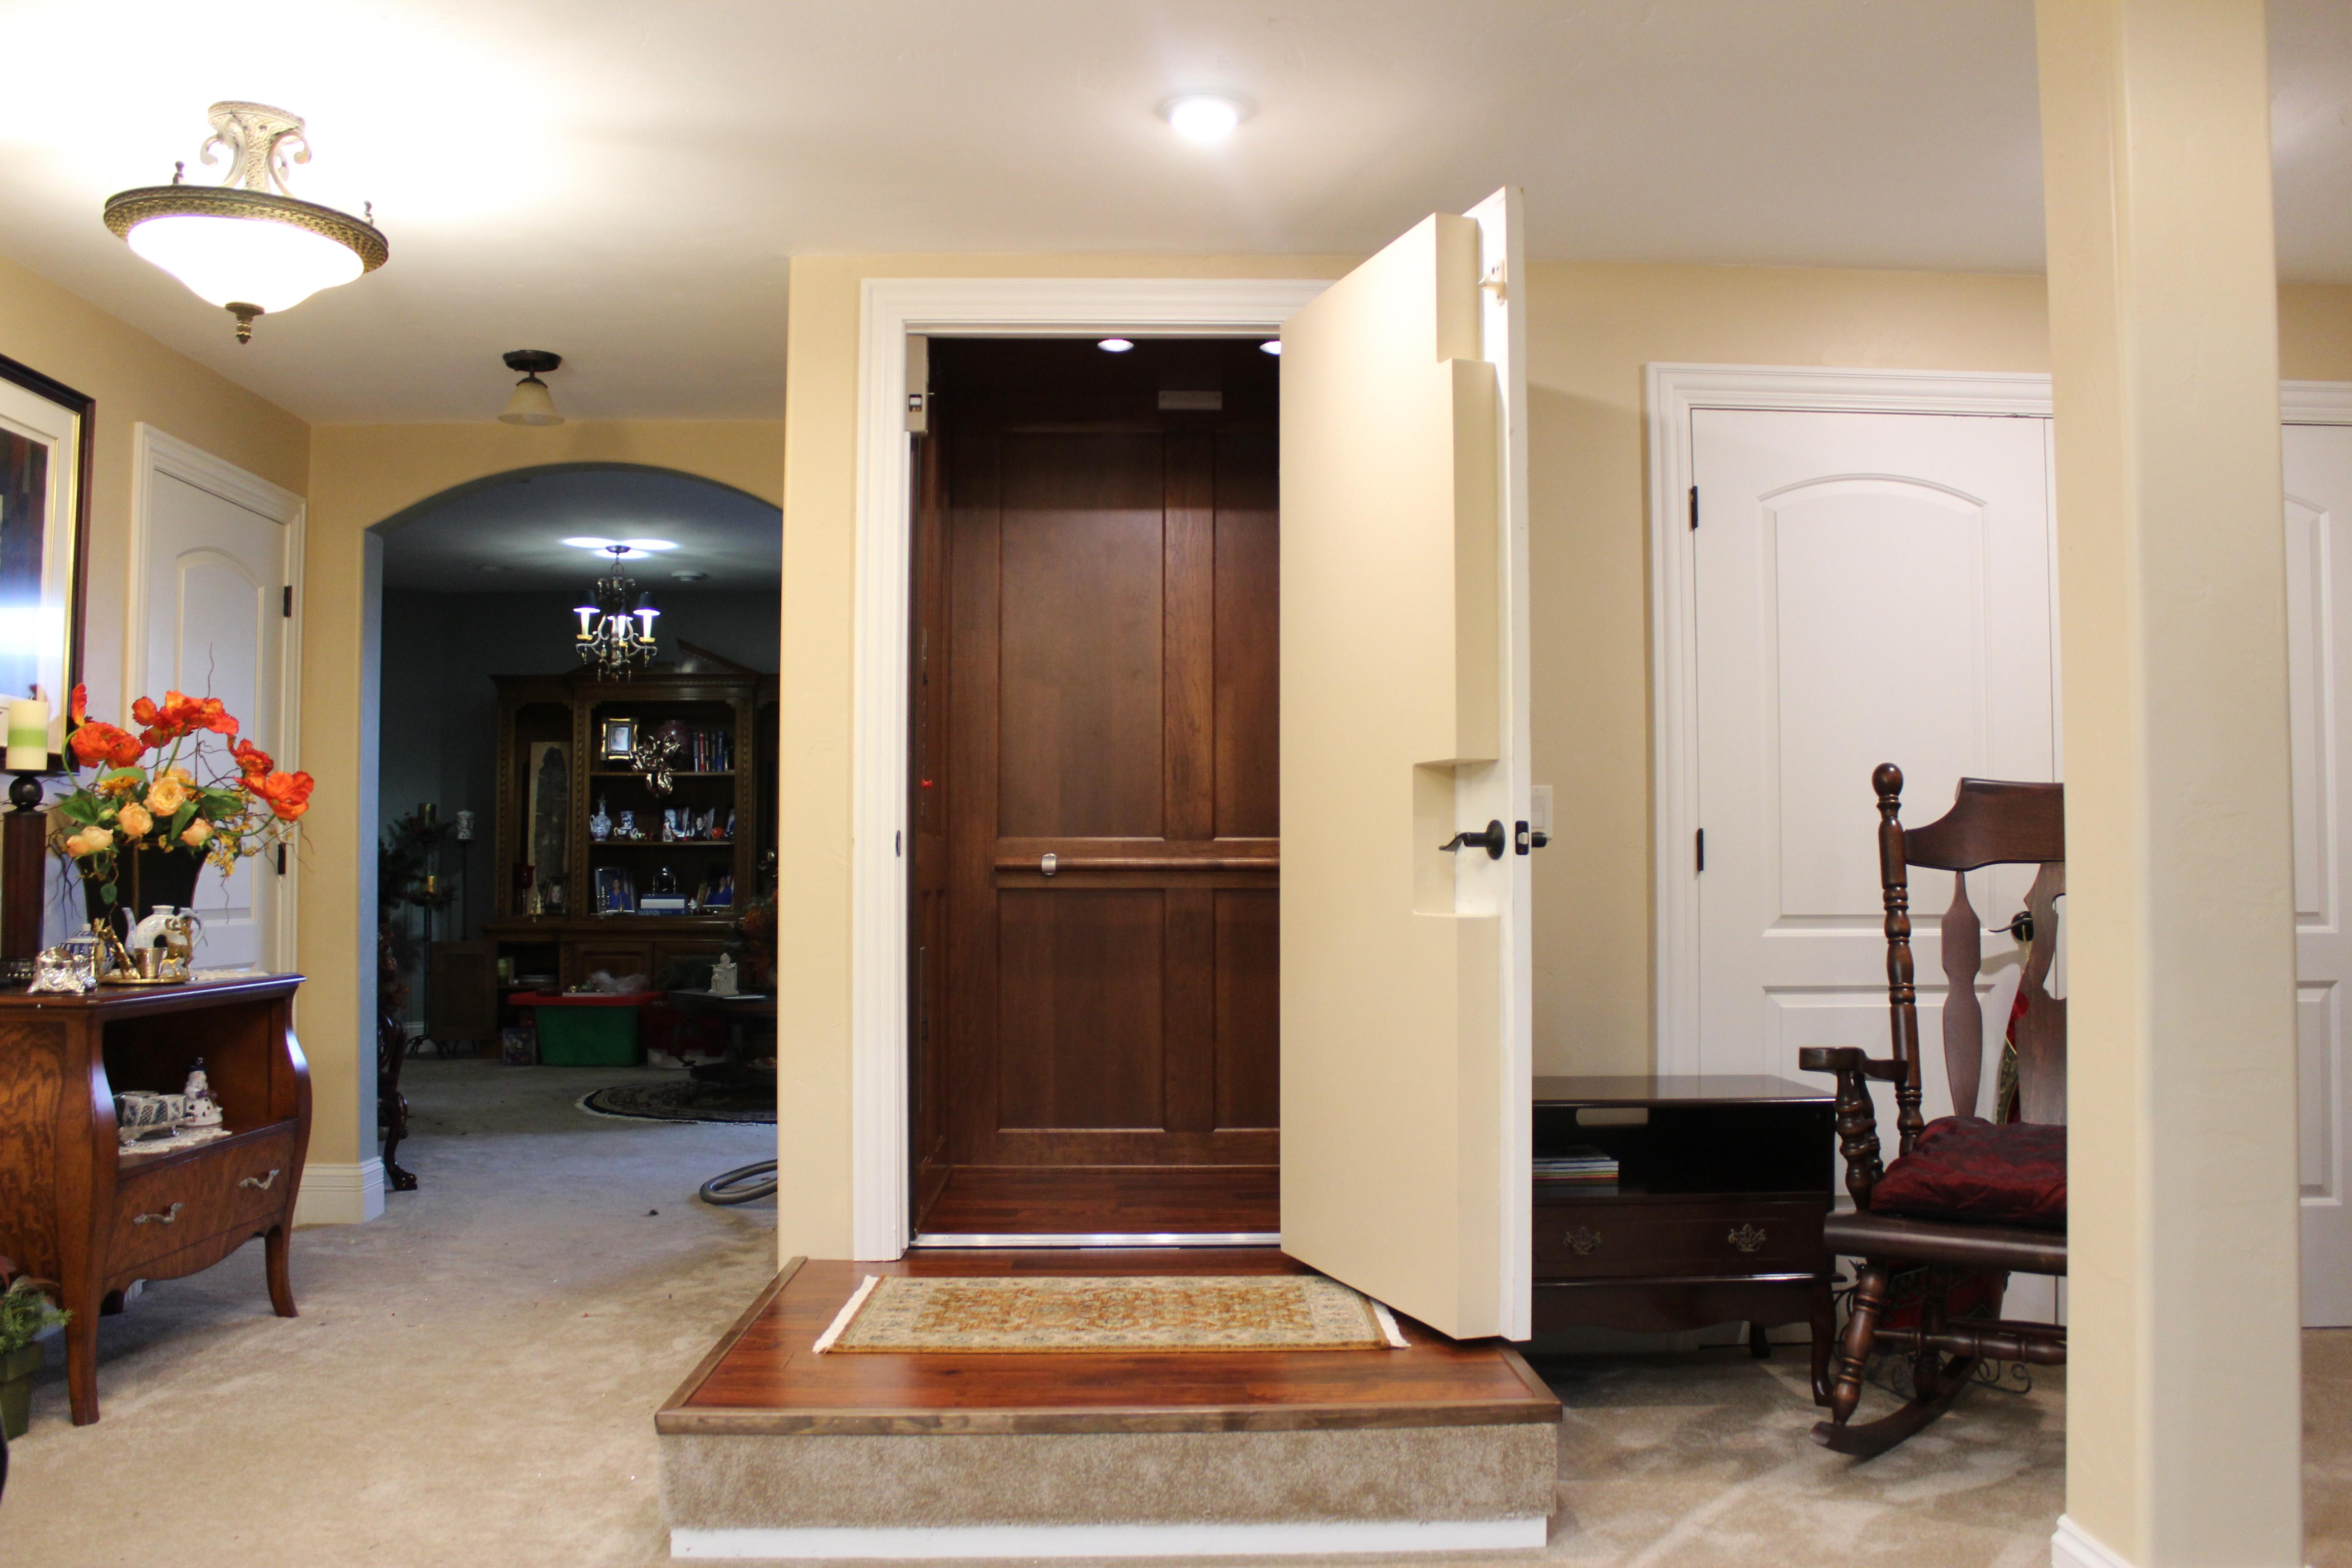 Waupaca ResidentialPaca-Lift Elevator Access Solutions